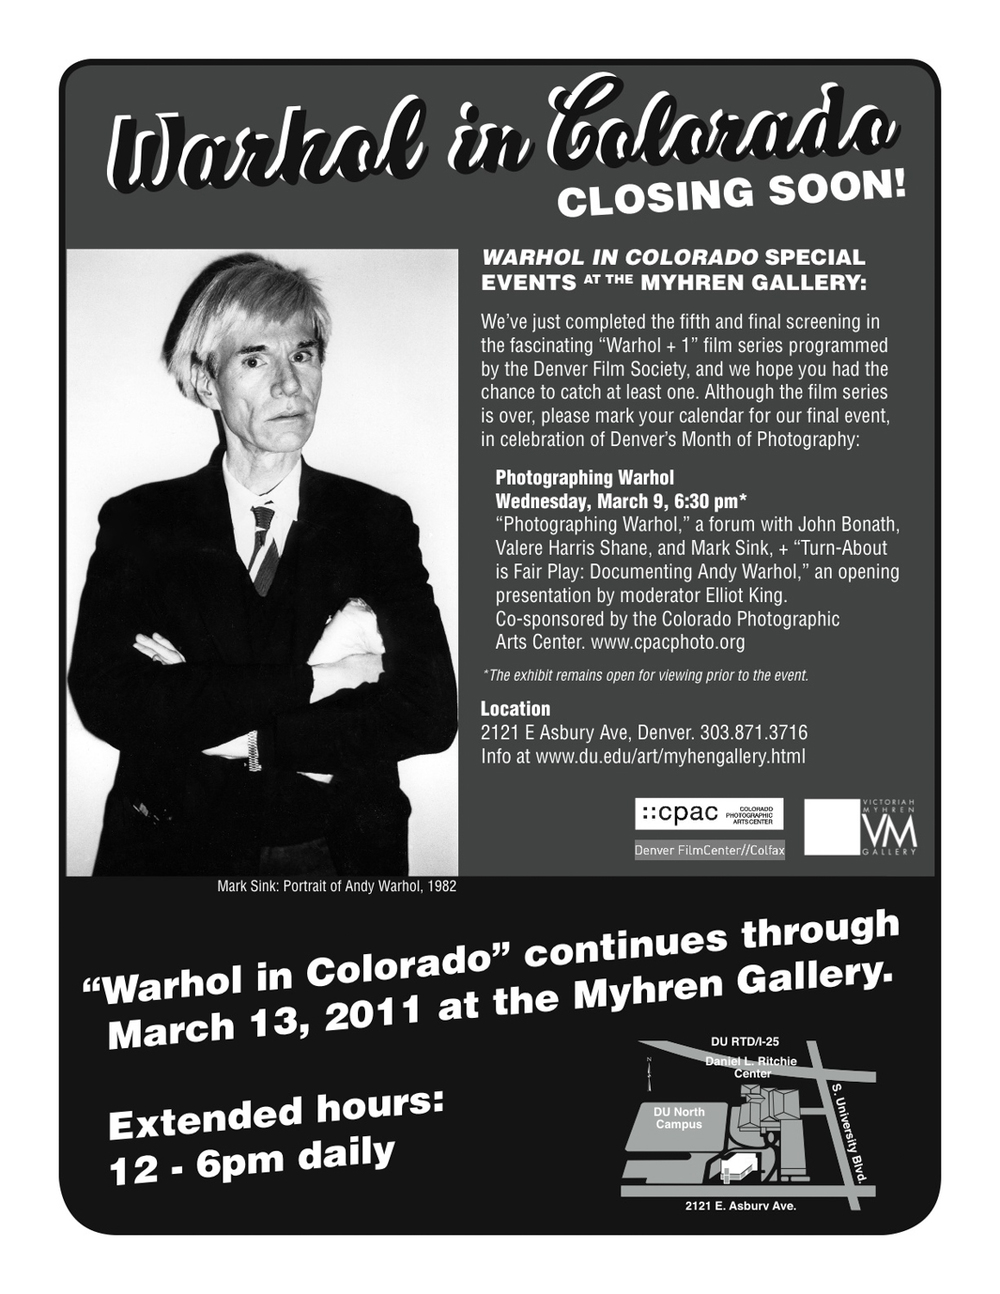 DU_Warhol_event.jpg